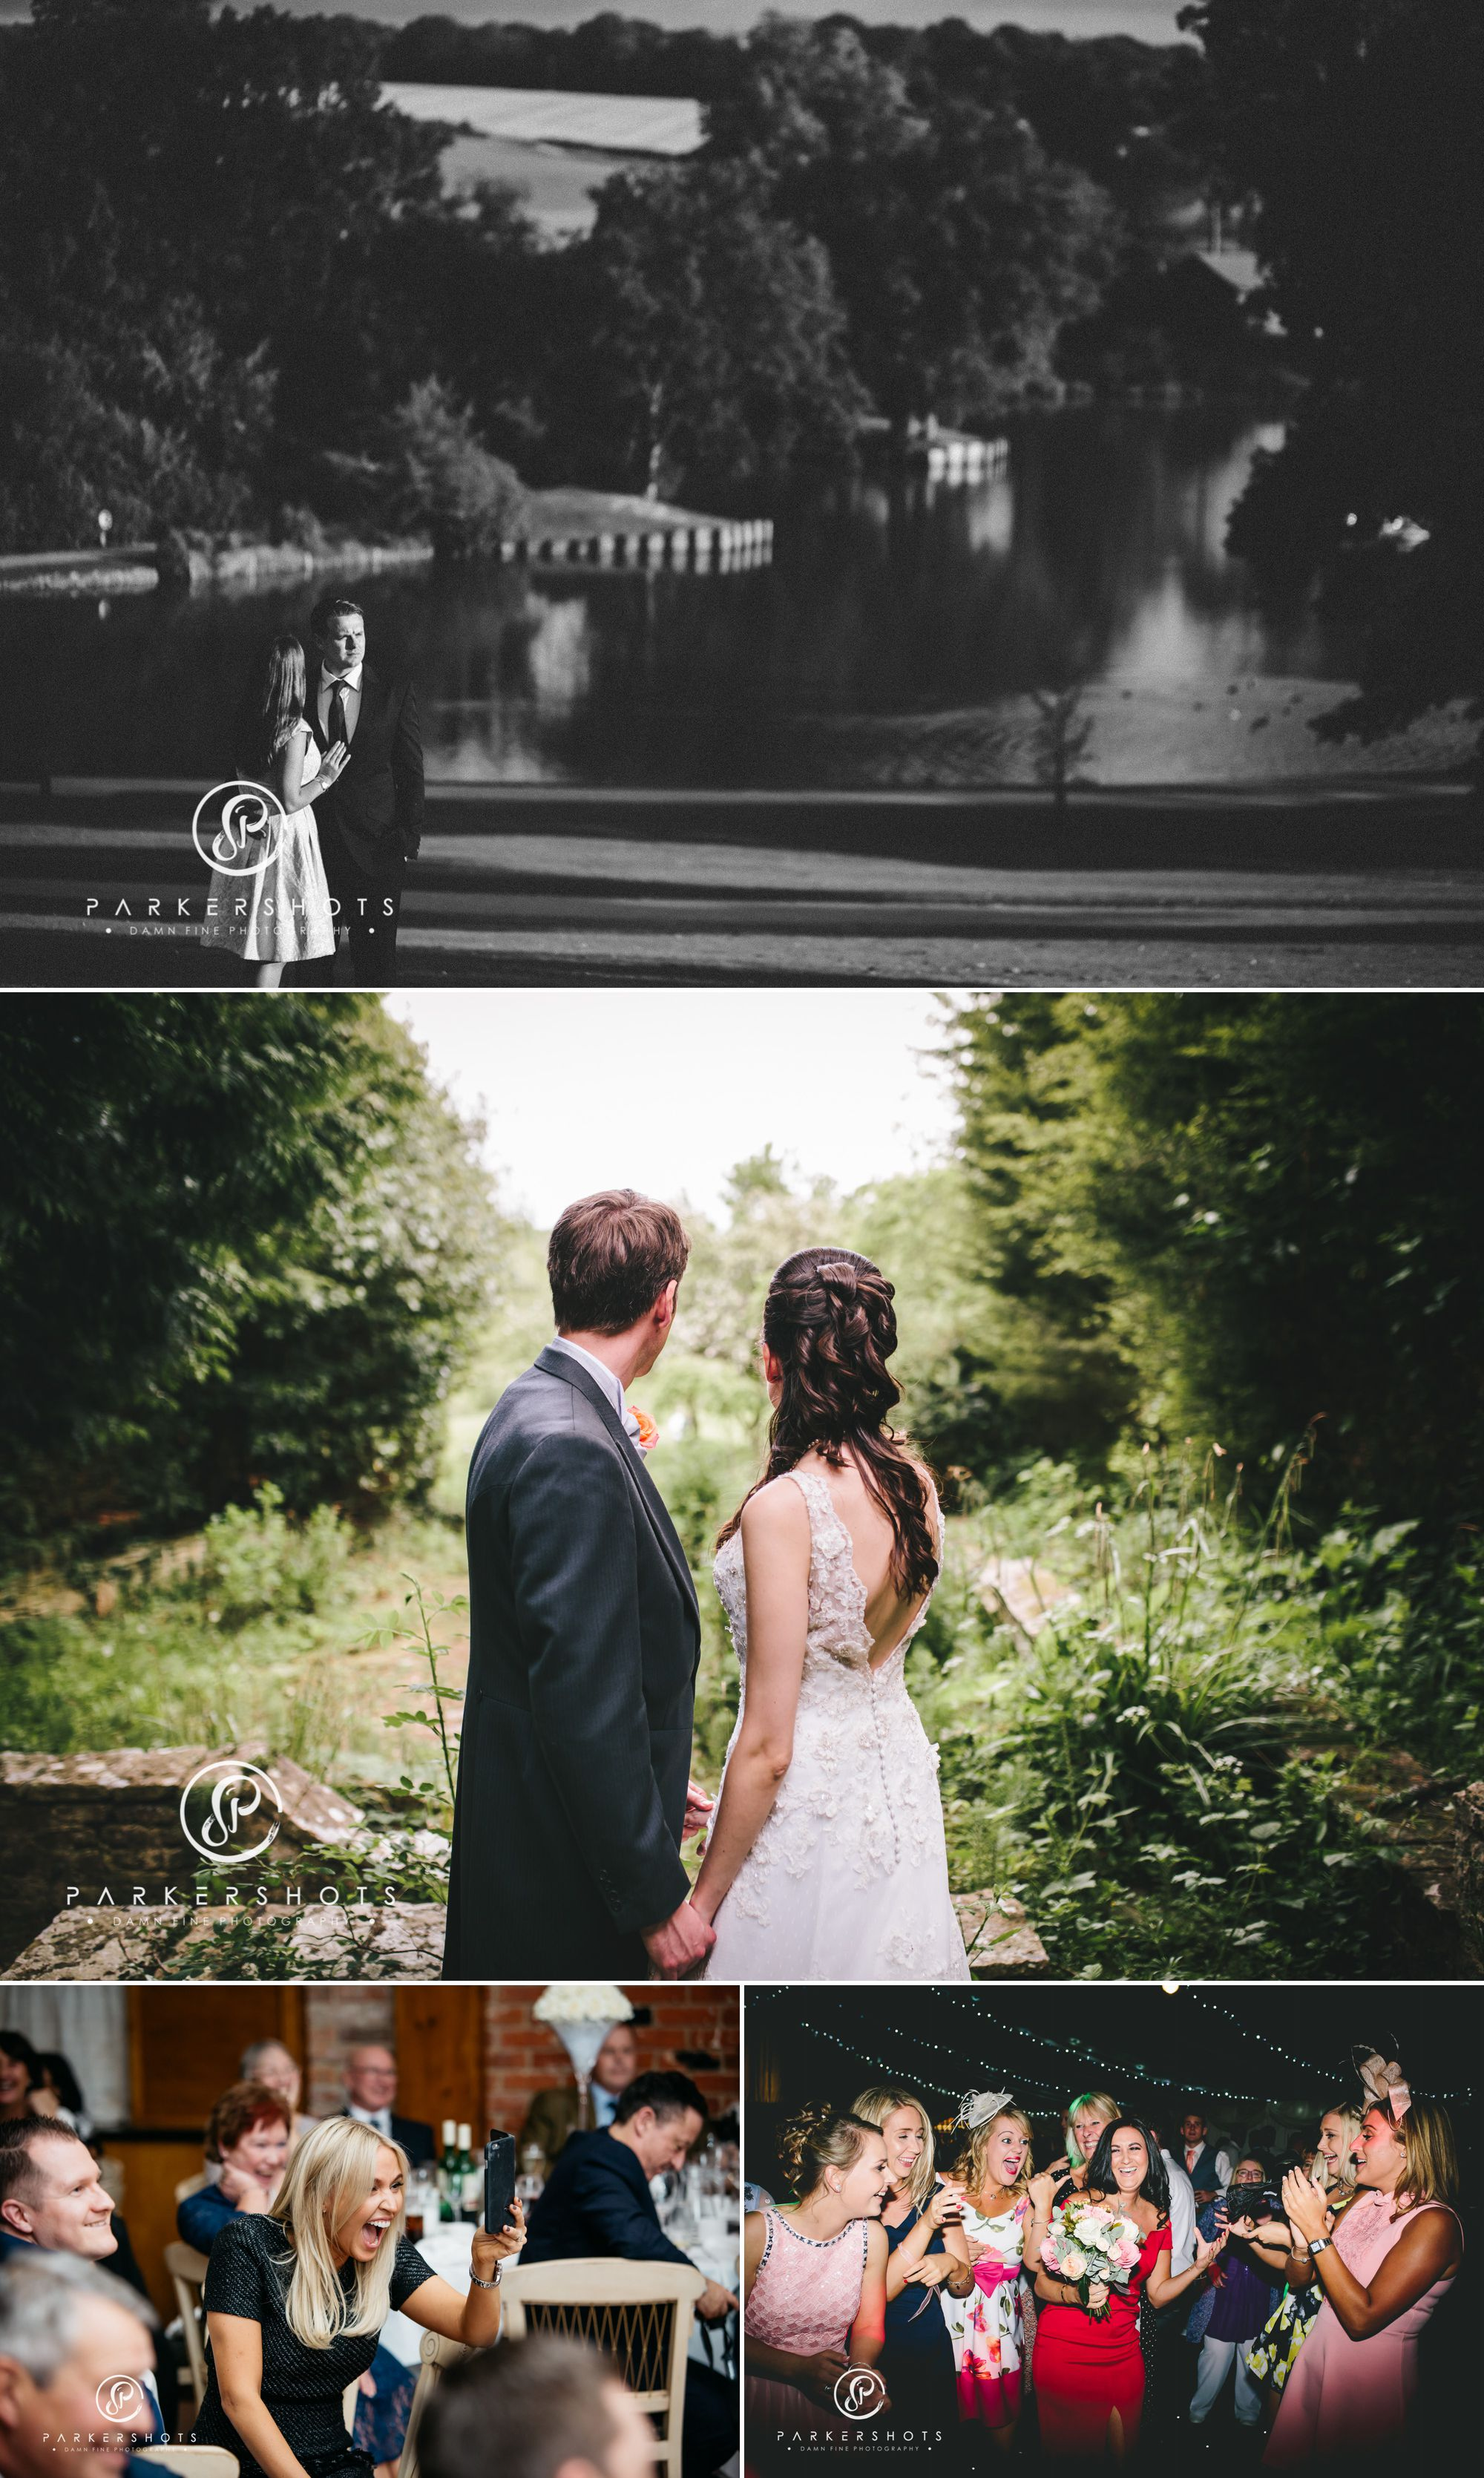 Best_Of_Wedding_Photographer_2015 19